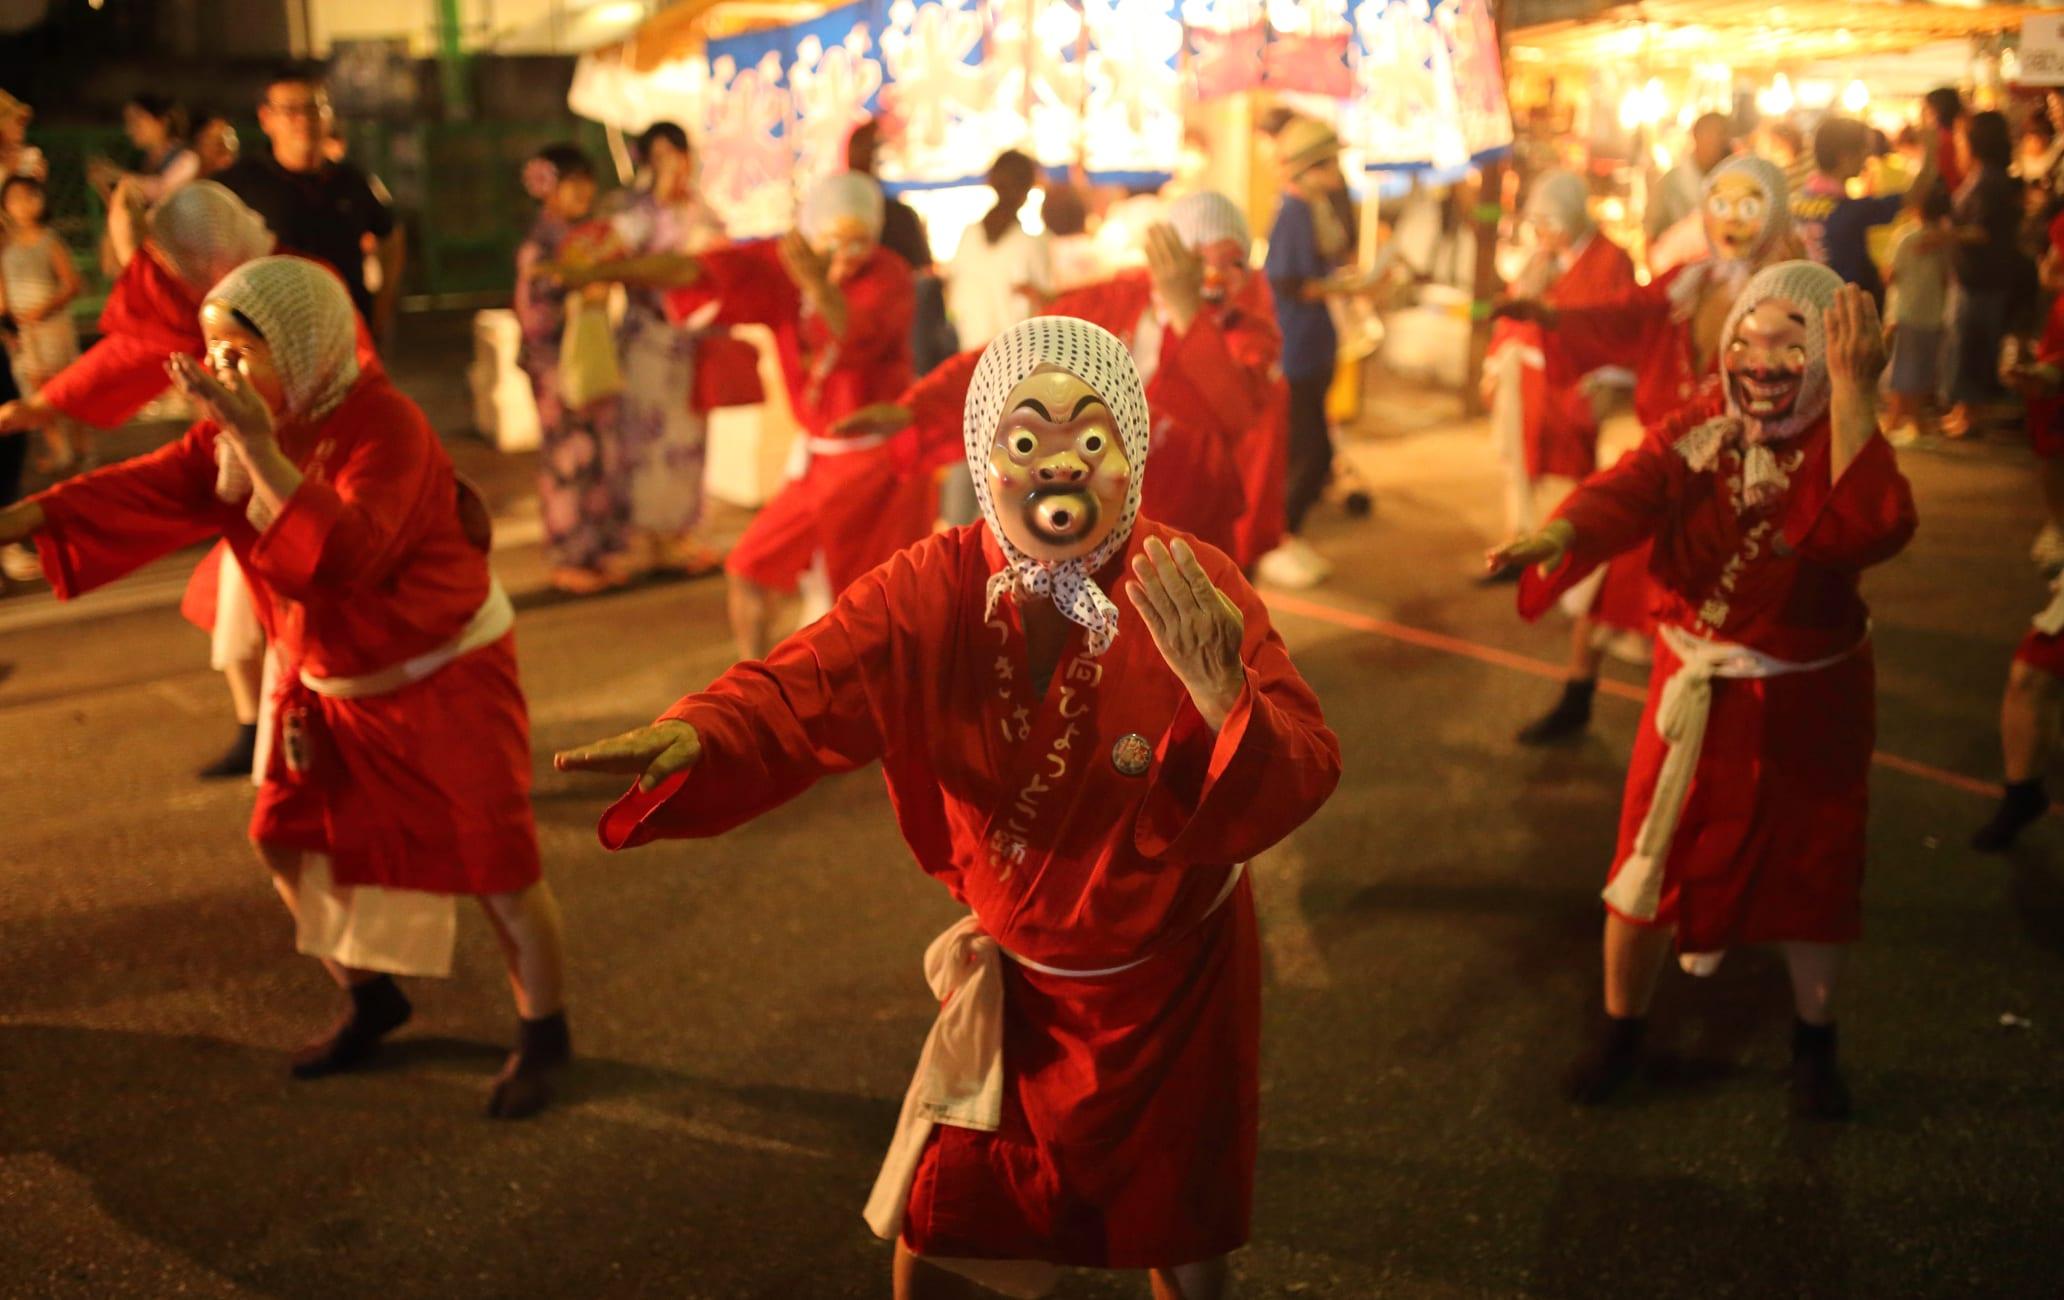 Hyuga Hyottoko Summer Festival